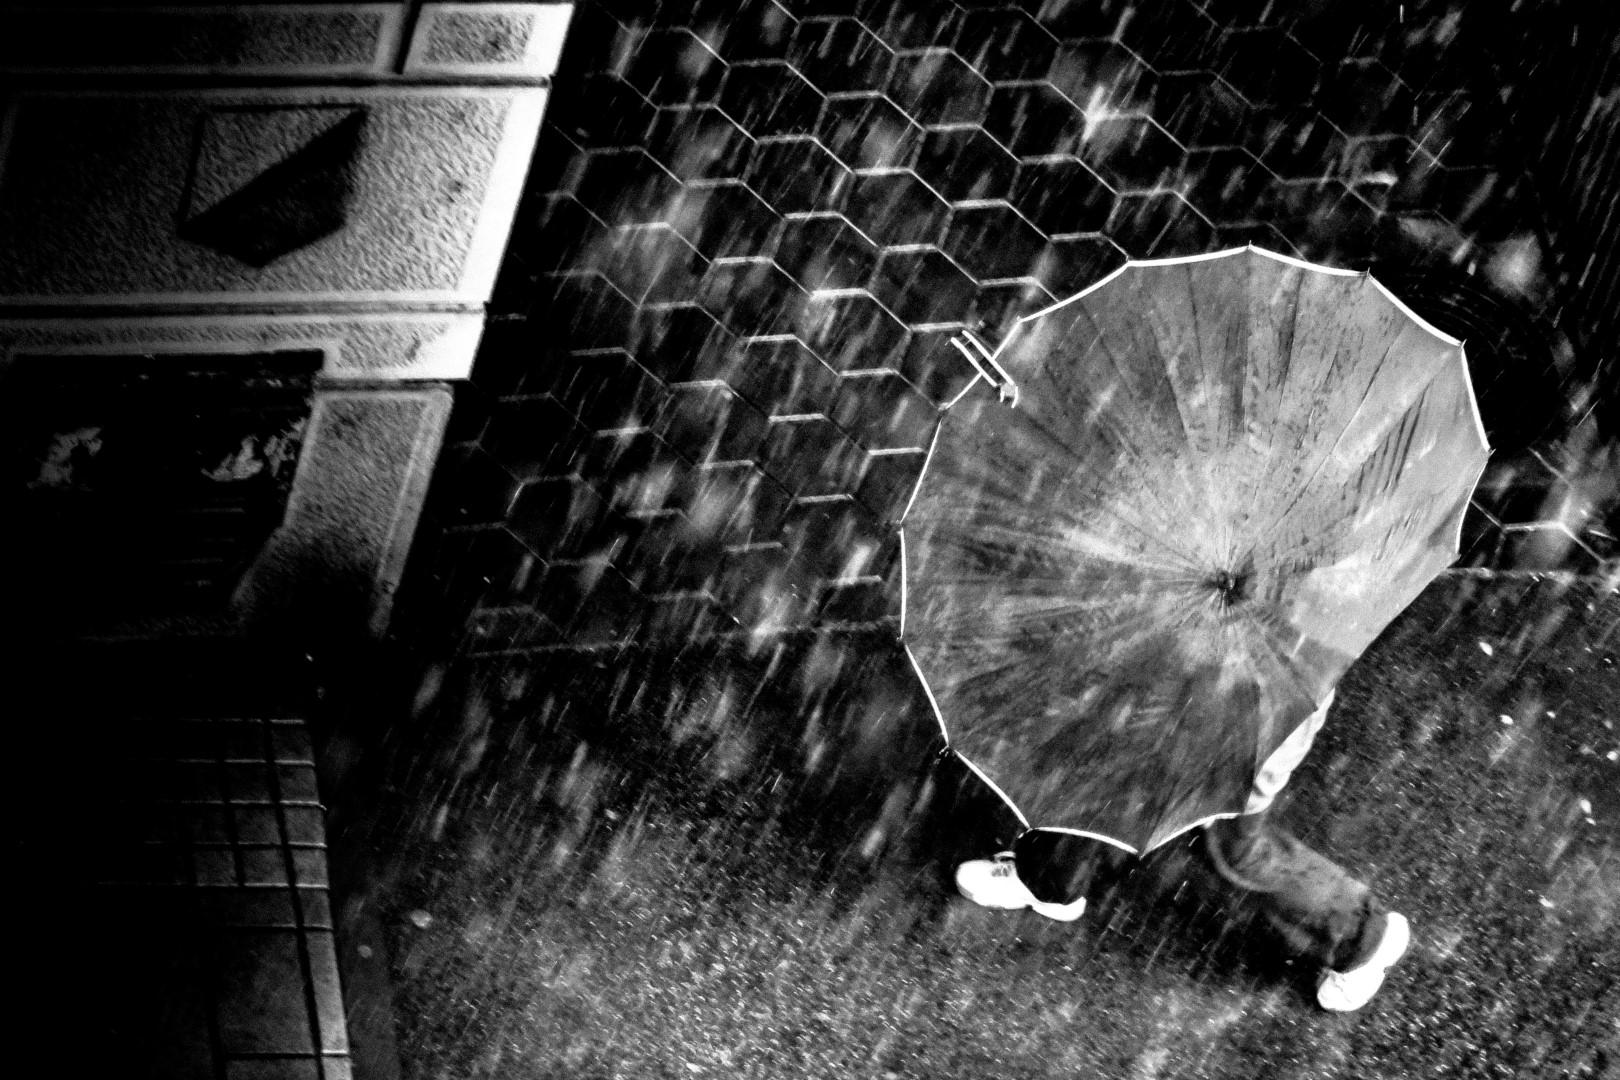 umbrella-shield_25874537073_o (Large).jpg